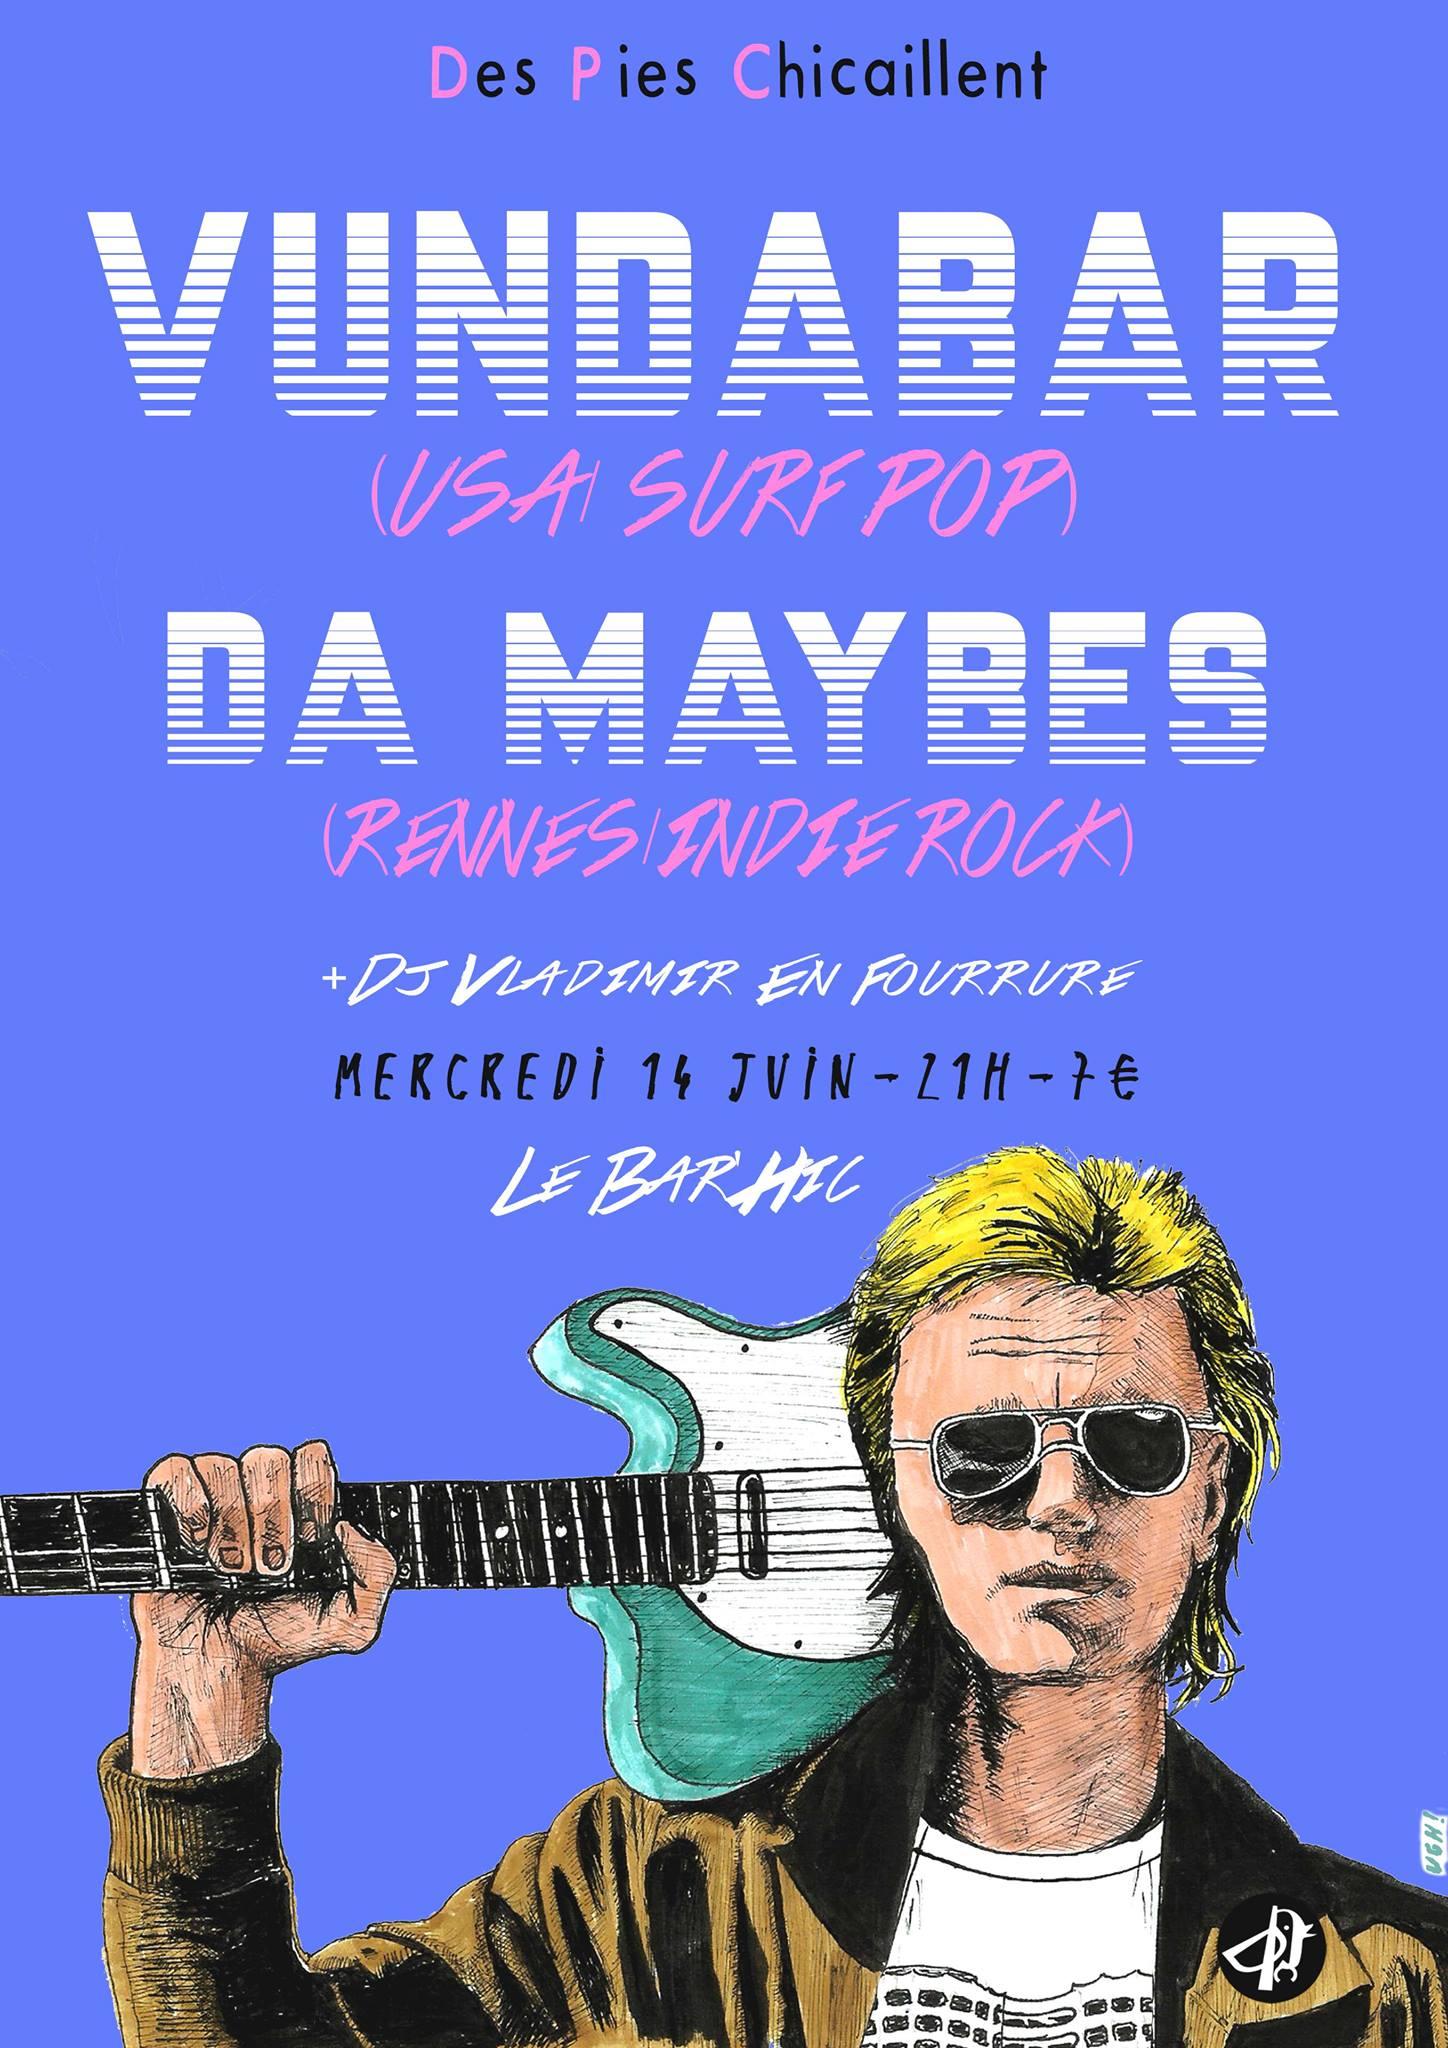 Concert w/ Vundabar (USA) @ Bar'Hic - © Hugh